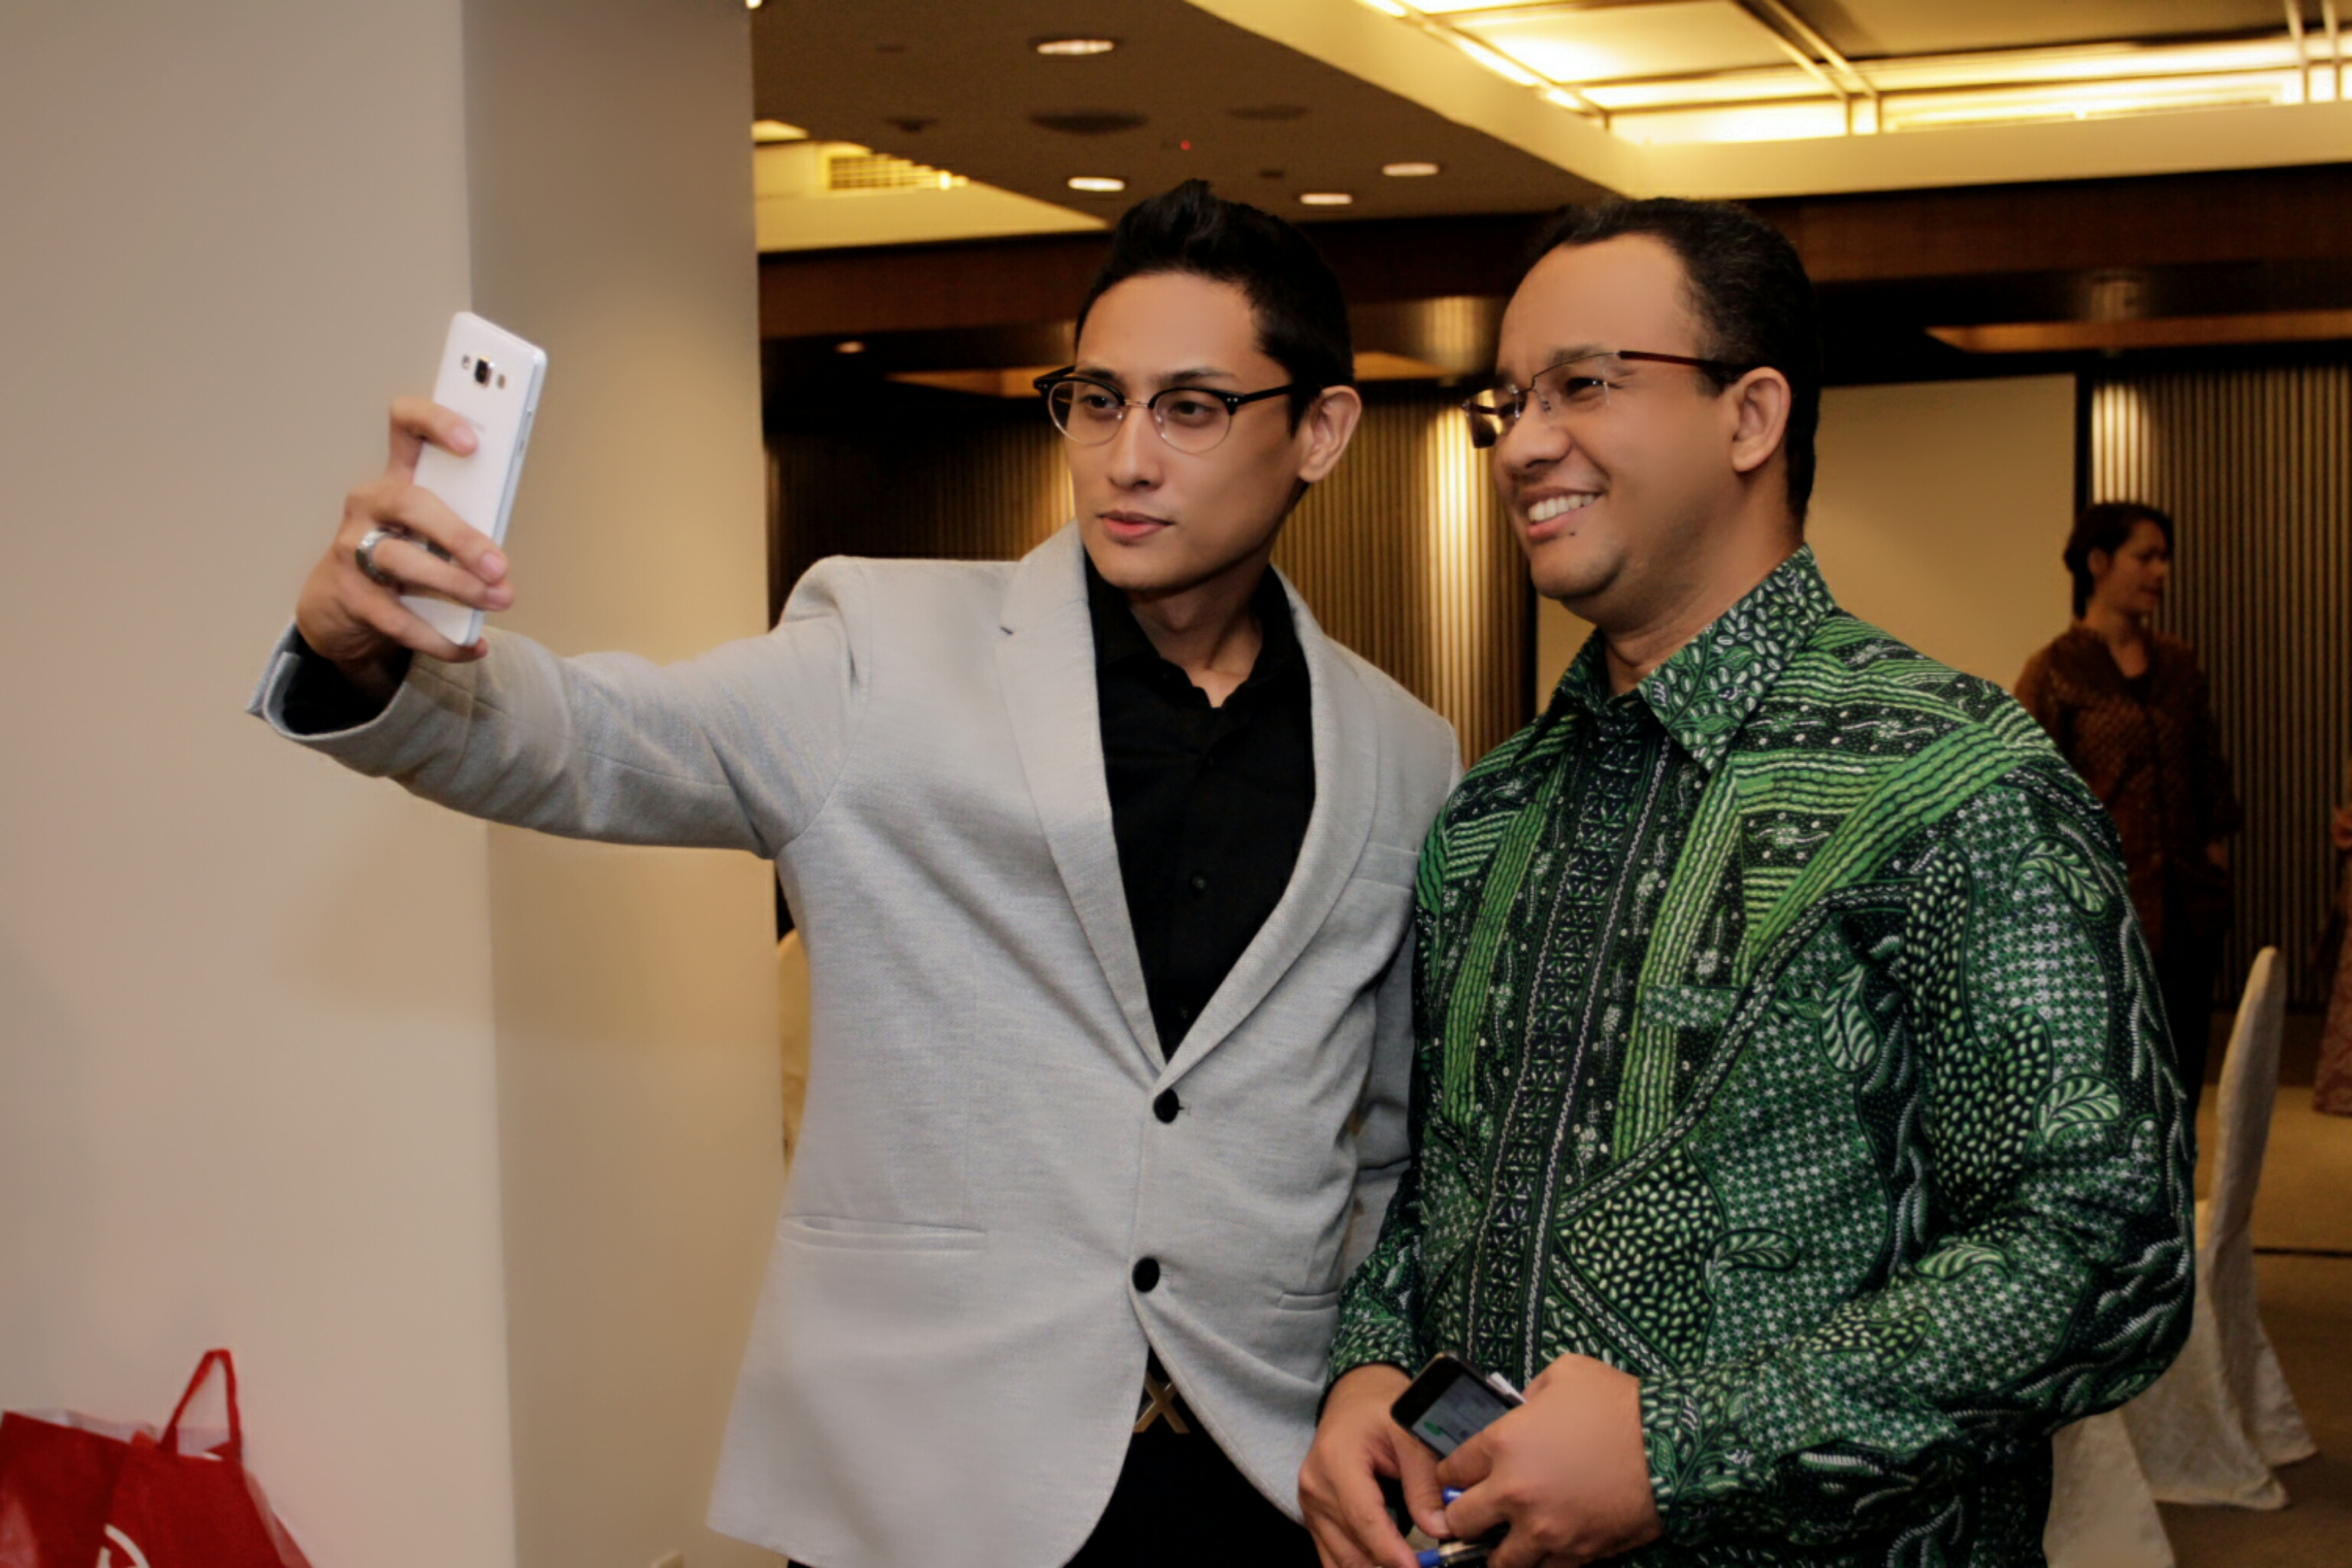 Anies Baswedan Ditantang Oleh Pengusaha Muda Analisa Www Indonesiana Id